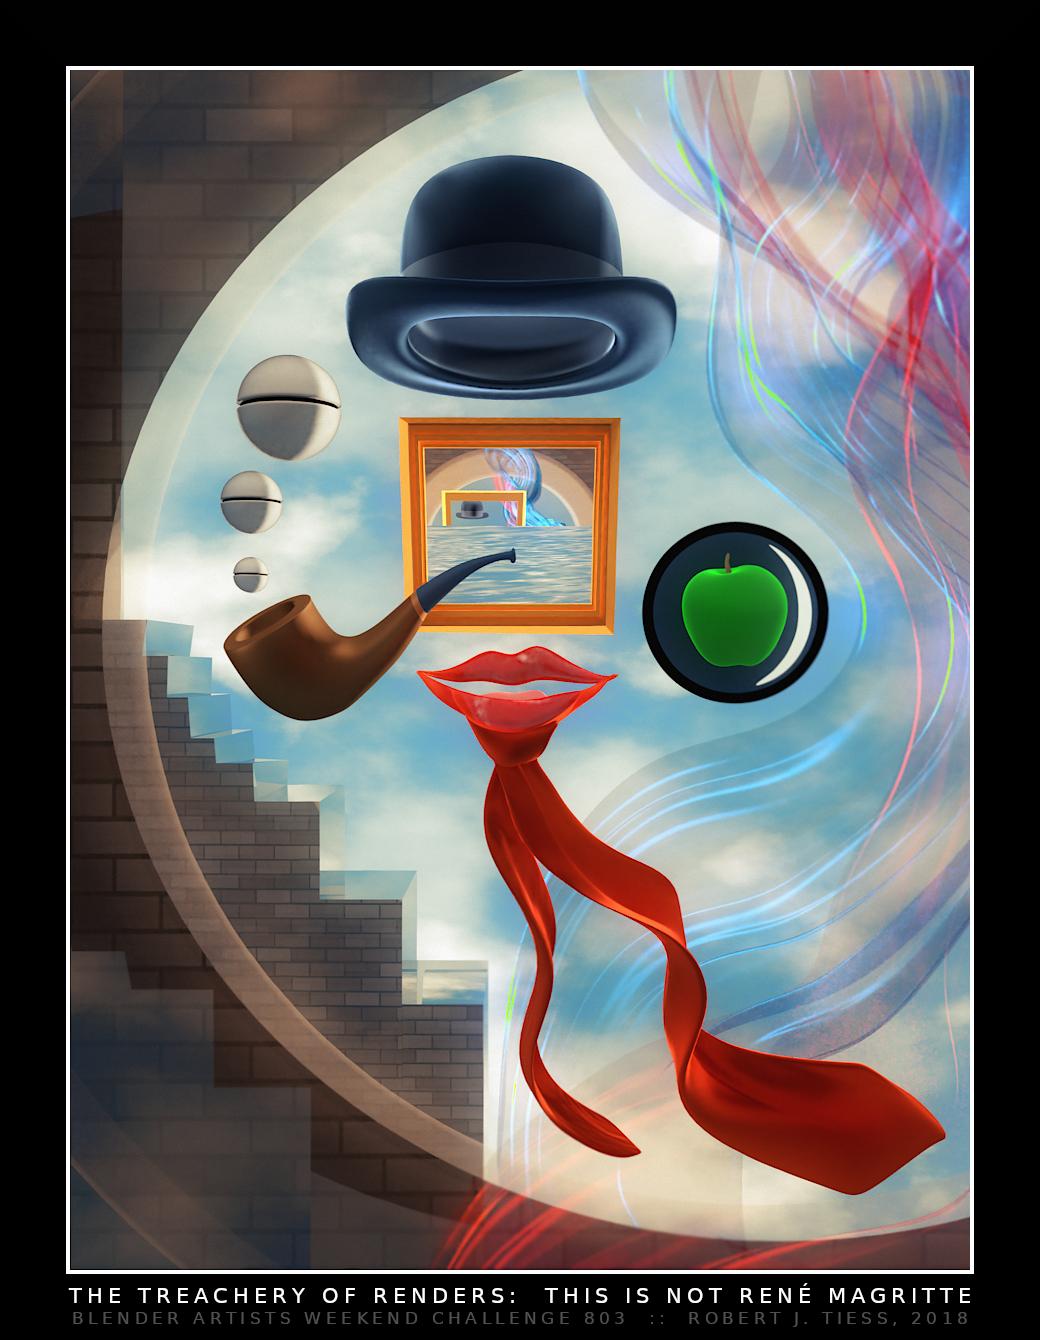 The Treachery of Renders: This Is Not Rene Magritte - By Robert J. Tiess